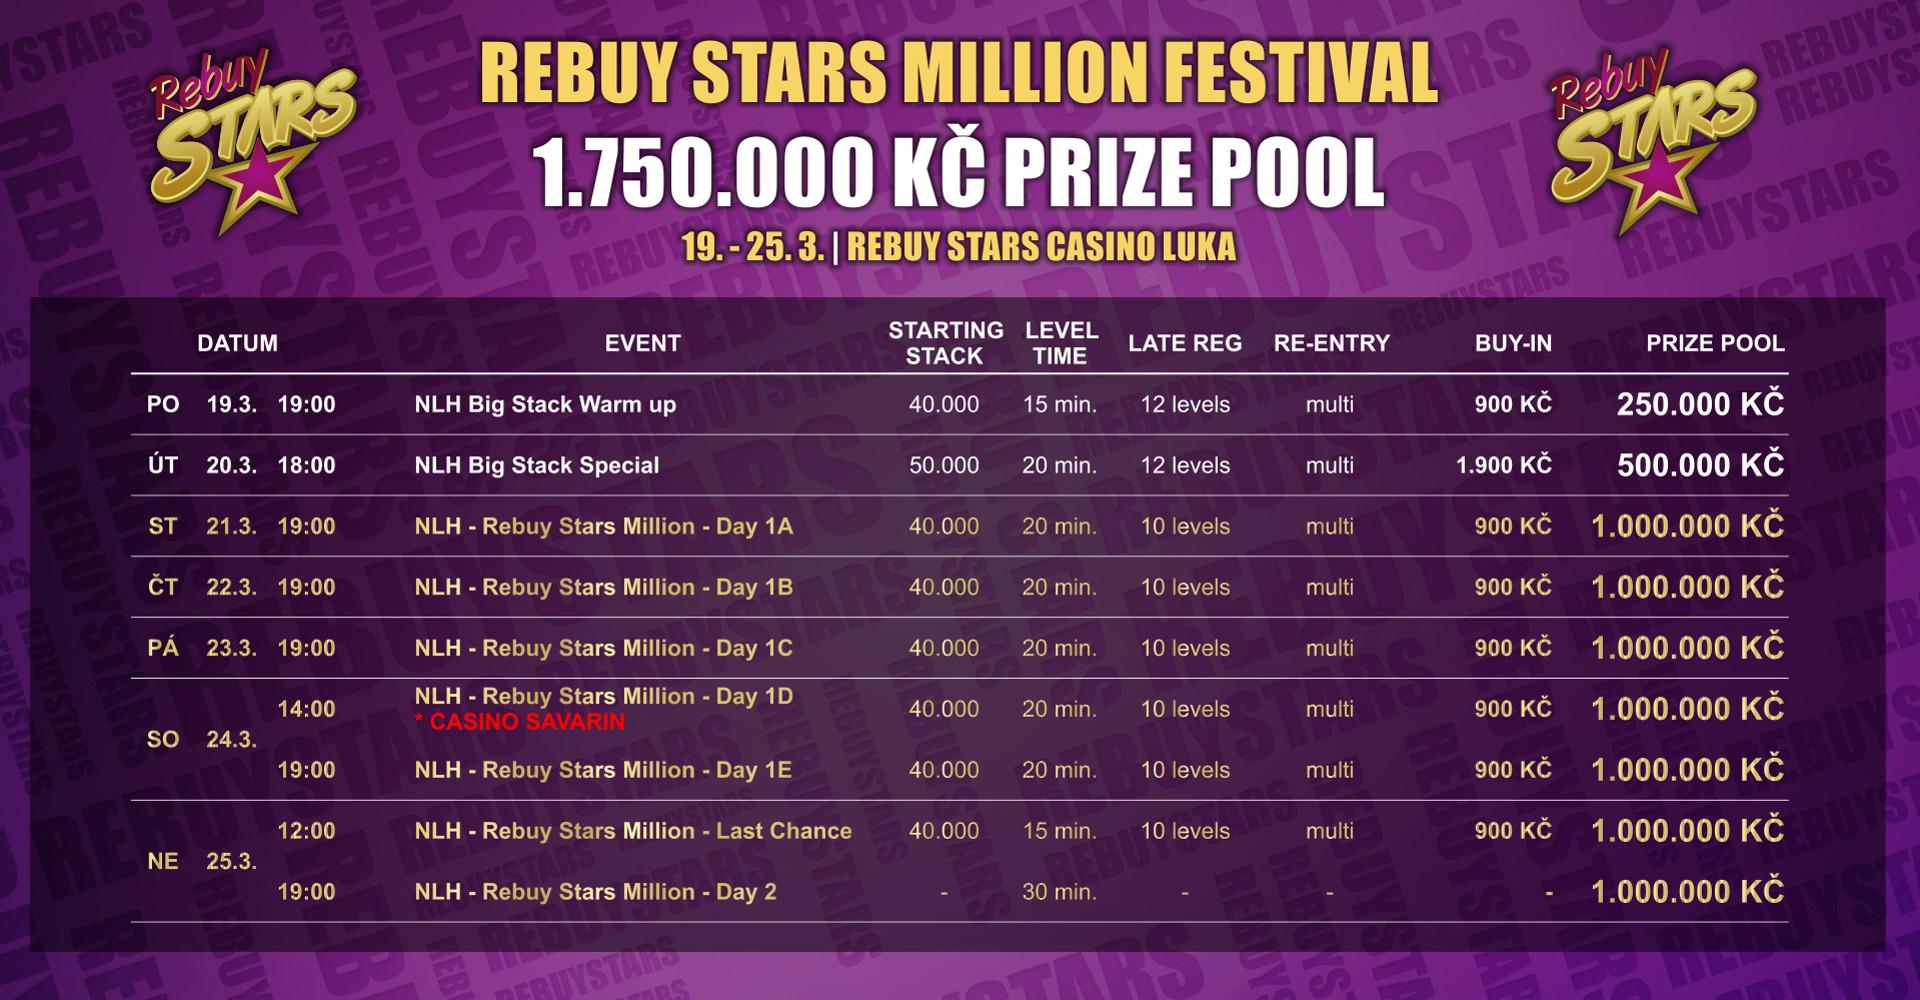 Rozpis turnajů březnového Rebuy Stars Million festivalu